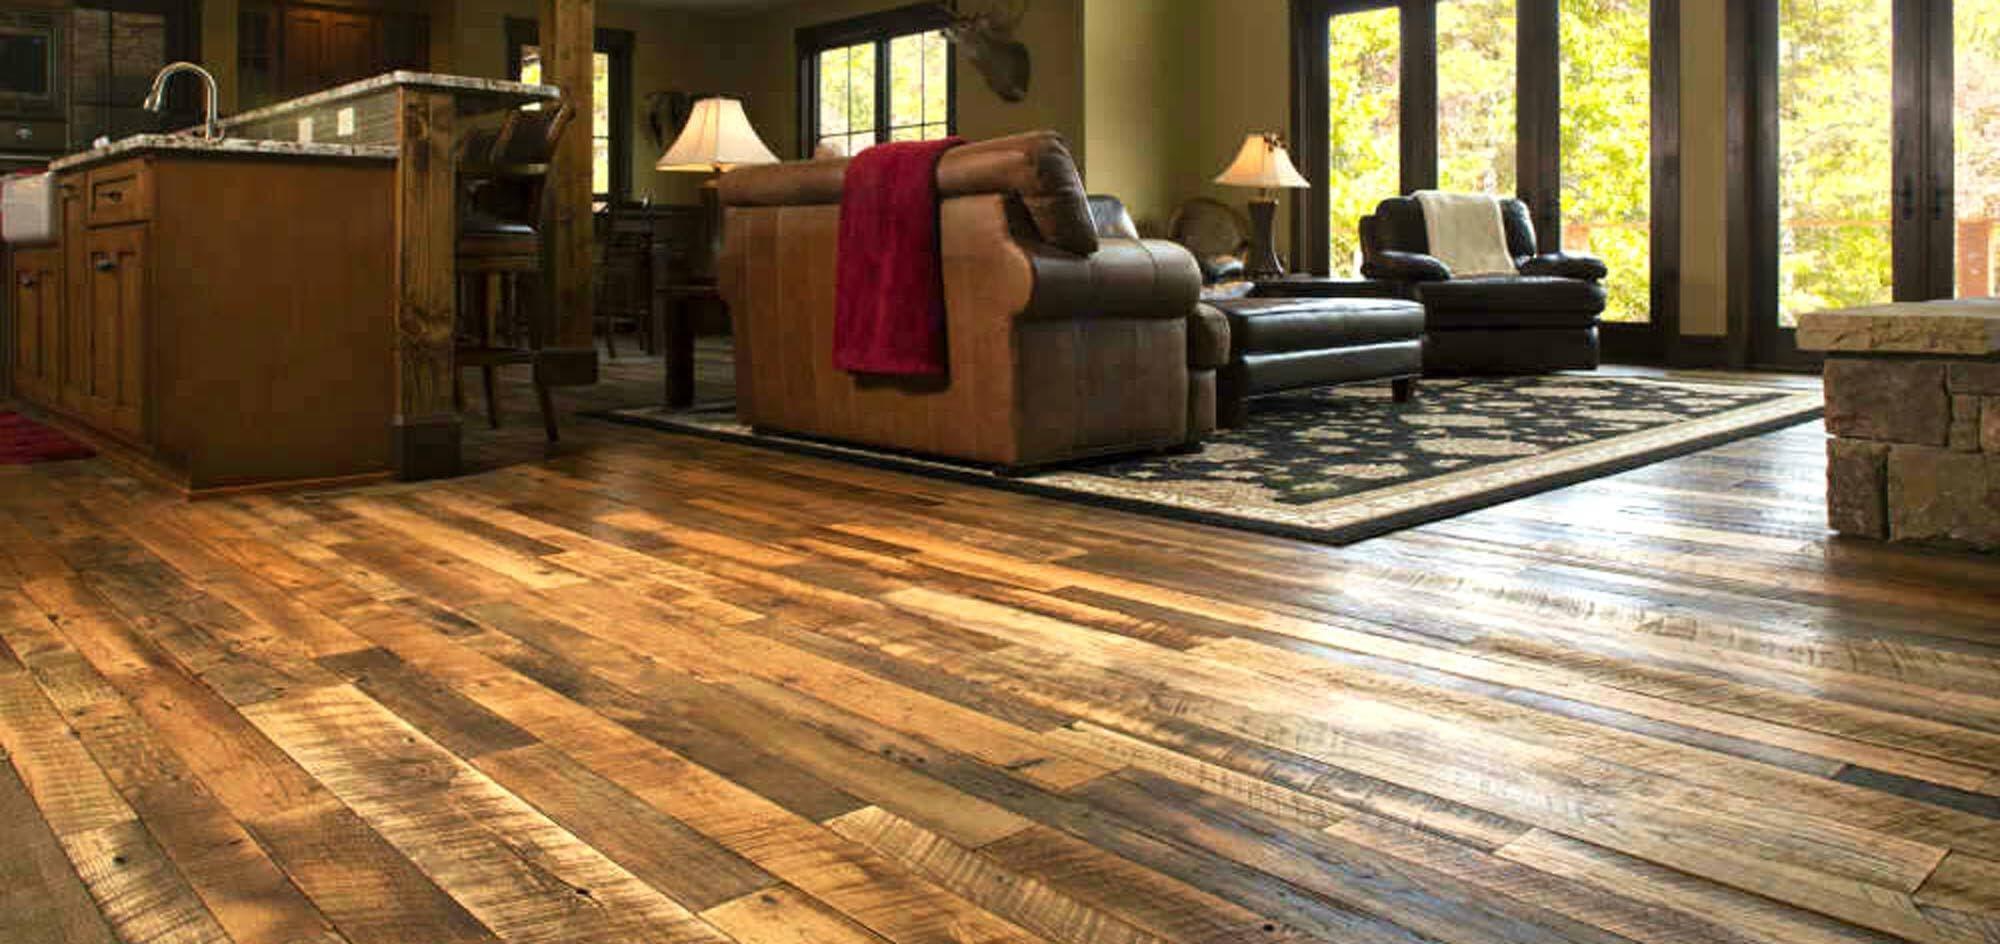 Reclaimed engineered hardwood floor in Black Mountain North Carolina.